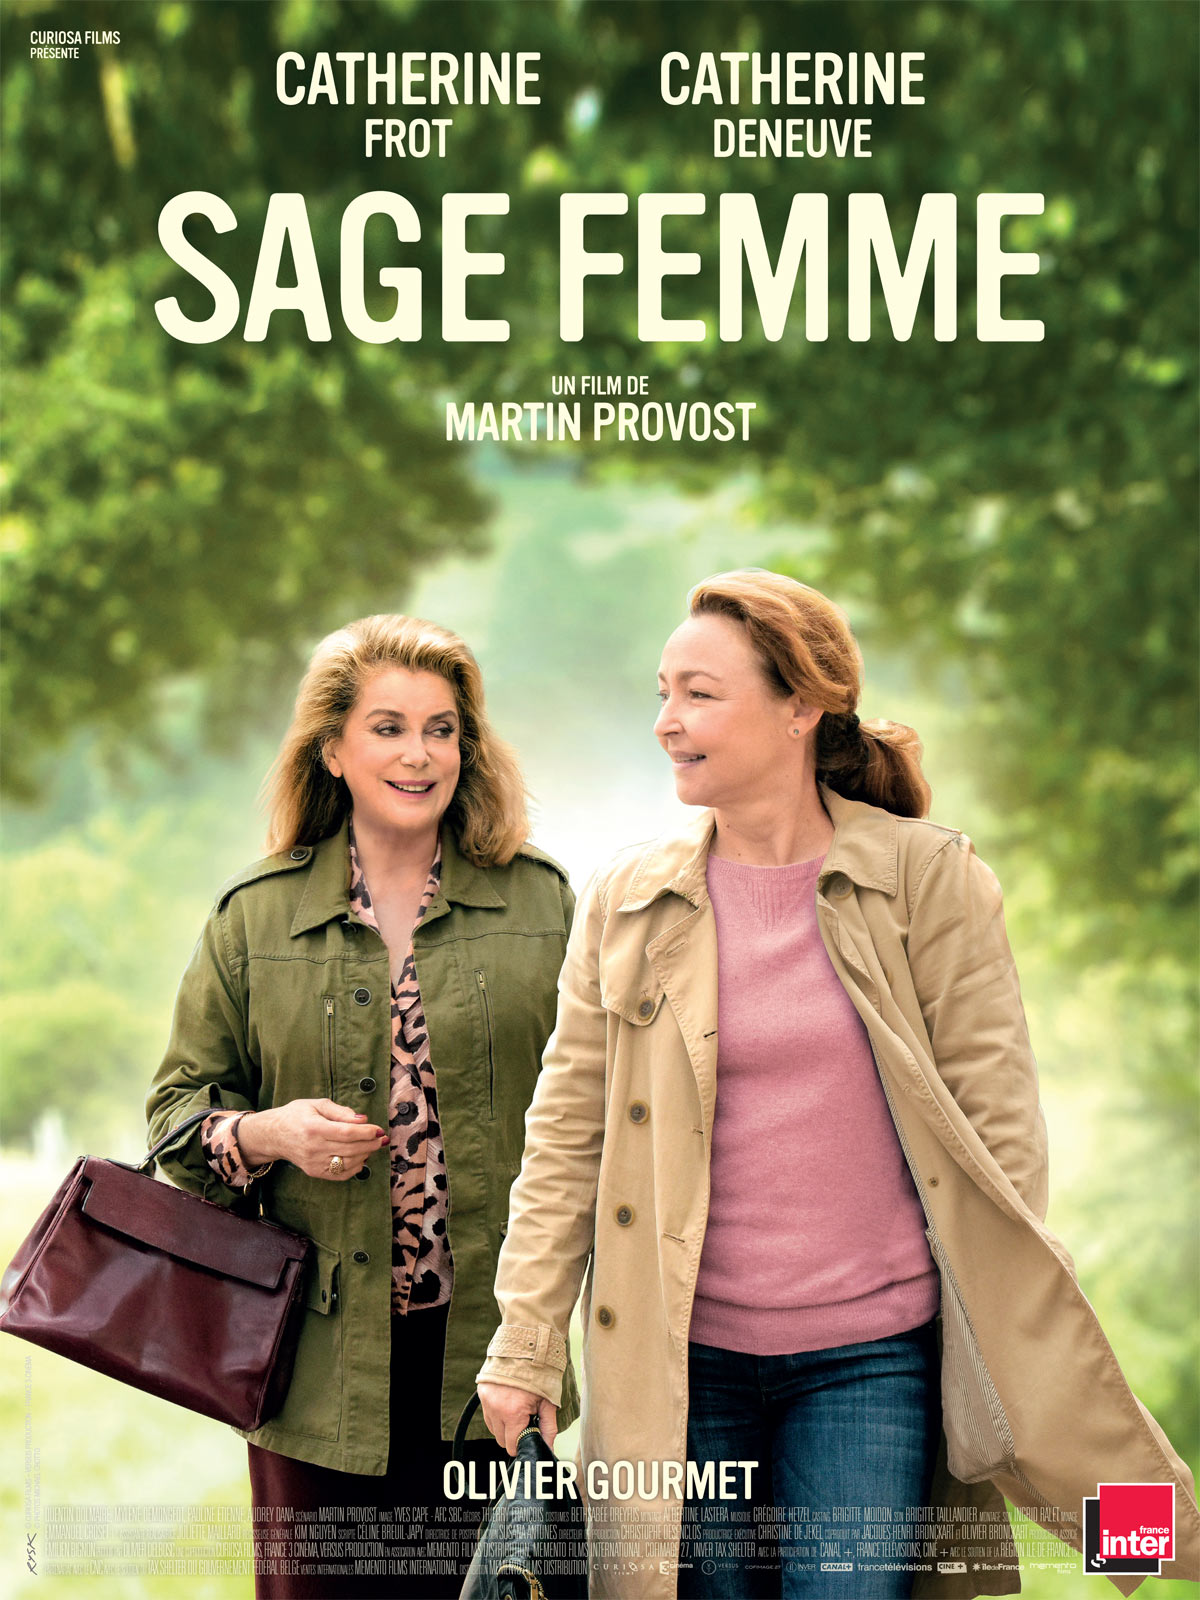 Sage femme film affiche